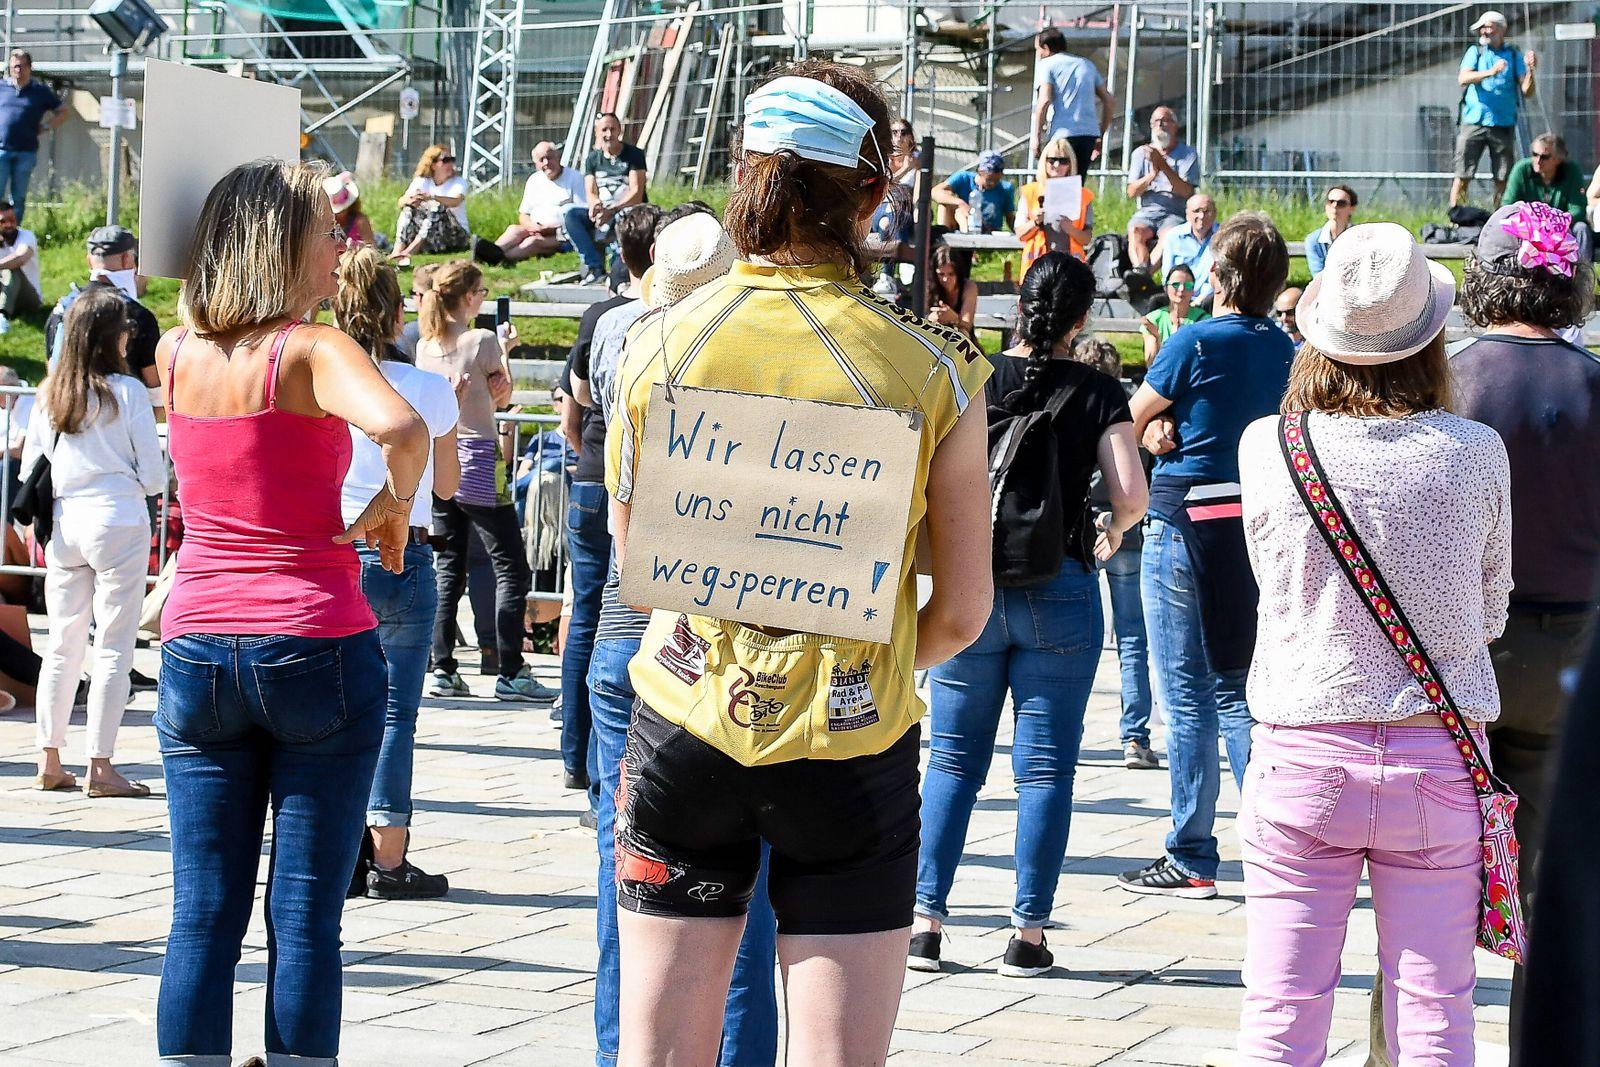 GER, Demo gegen Corona-Regeln in Bayern / 09.05.2020, Hildegardplatz, Kempten, GER, Demo gegen Corona-Regeln in Bayern,